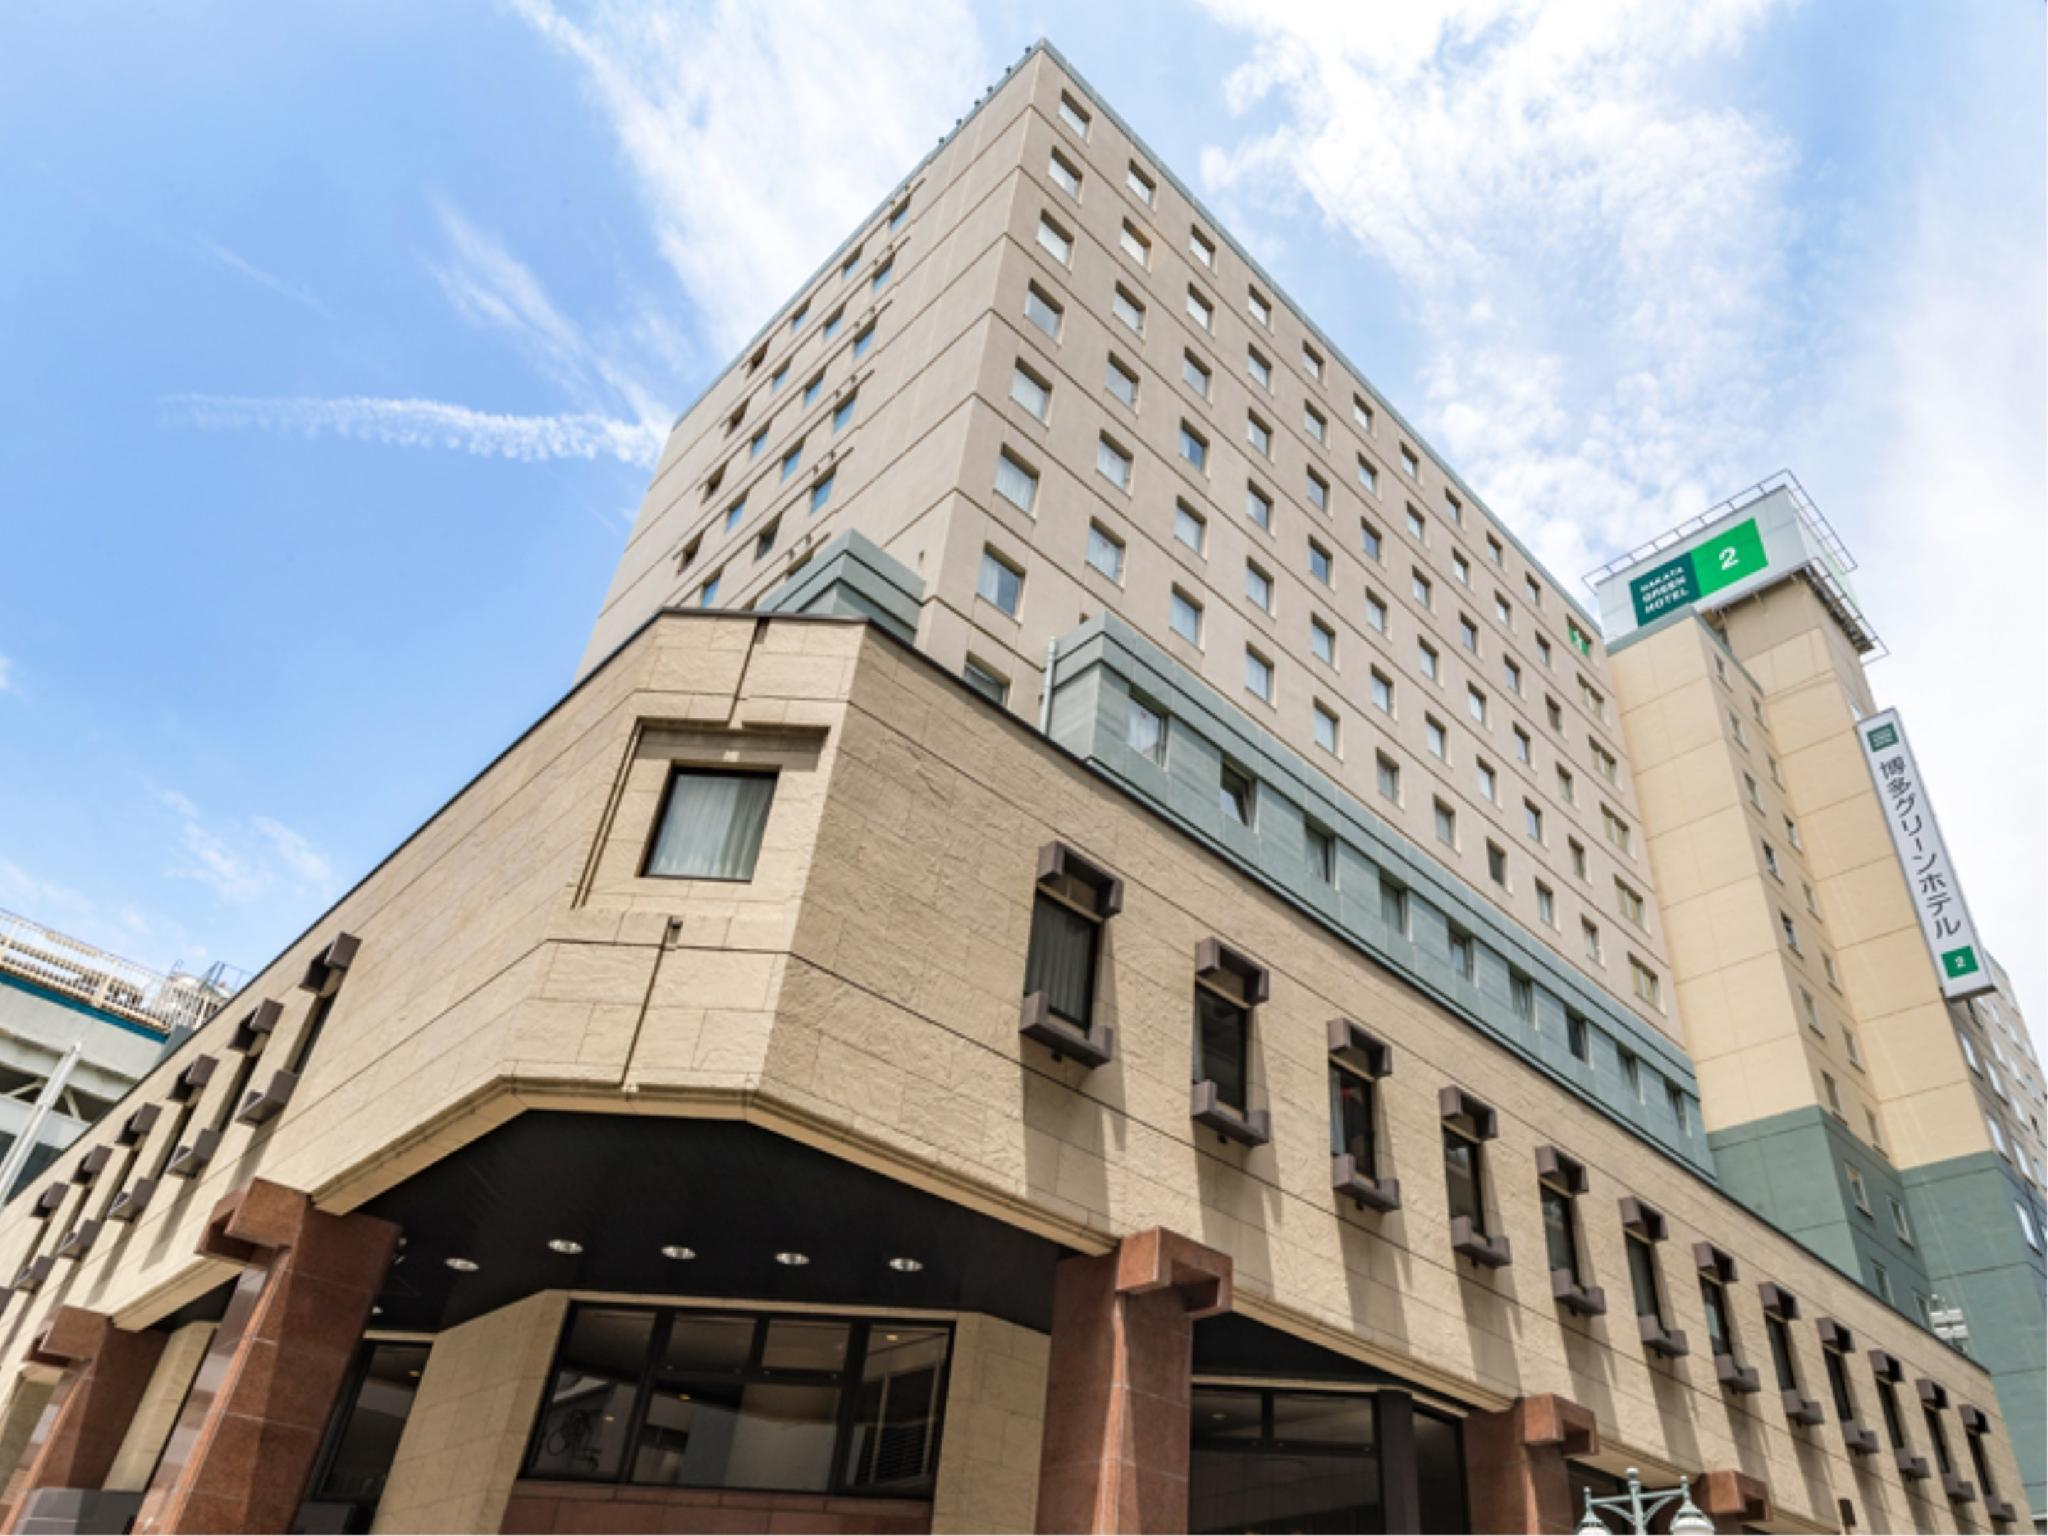 Hakata Green Hotel No. 2